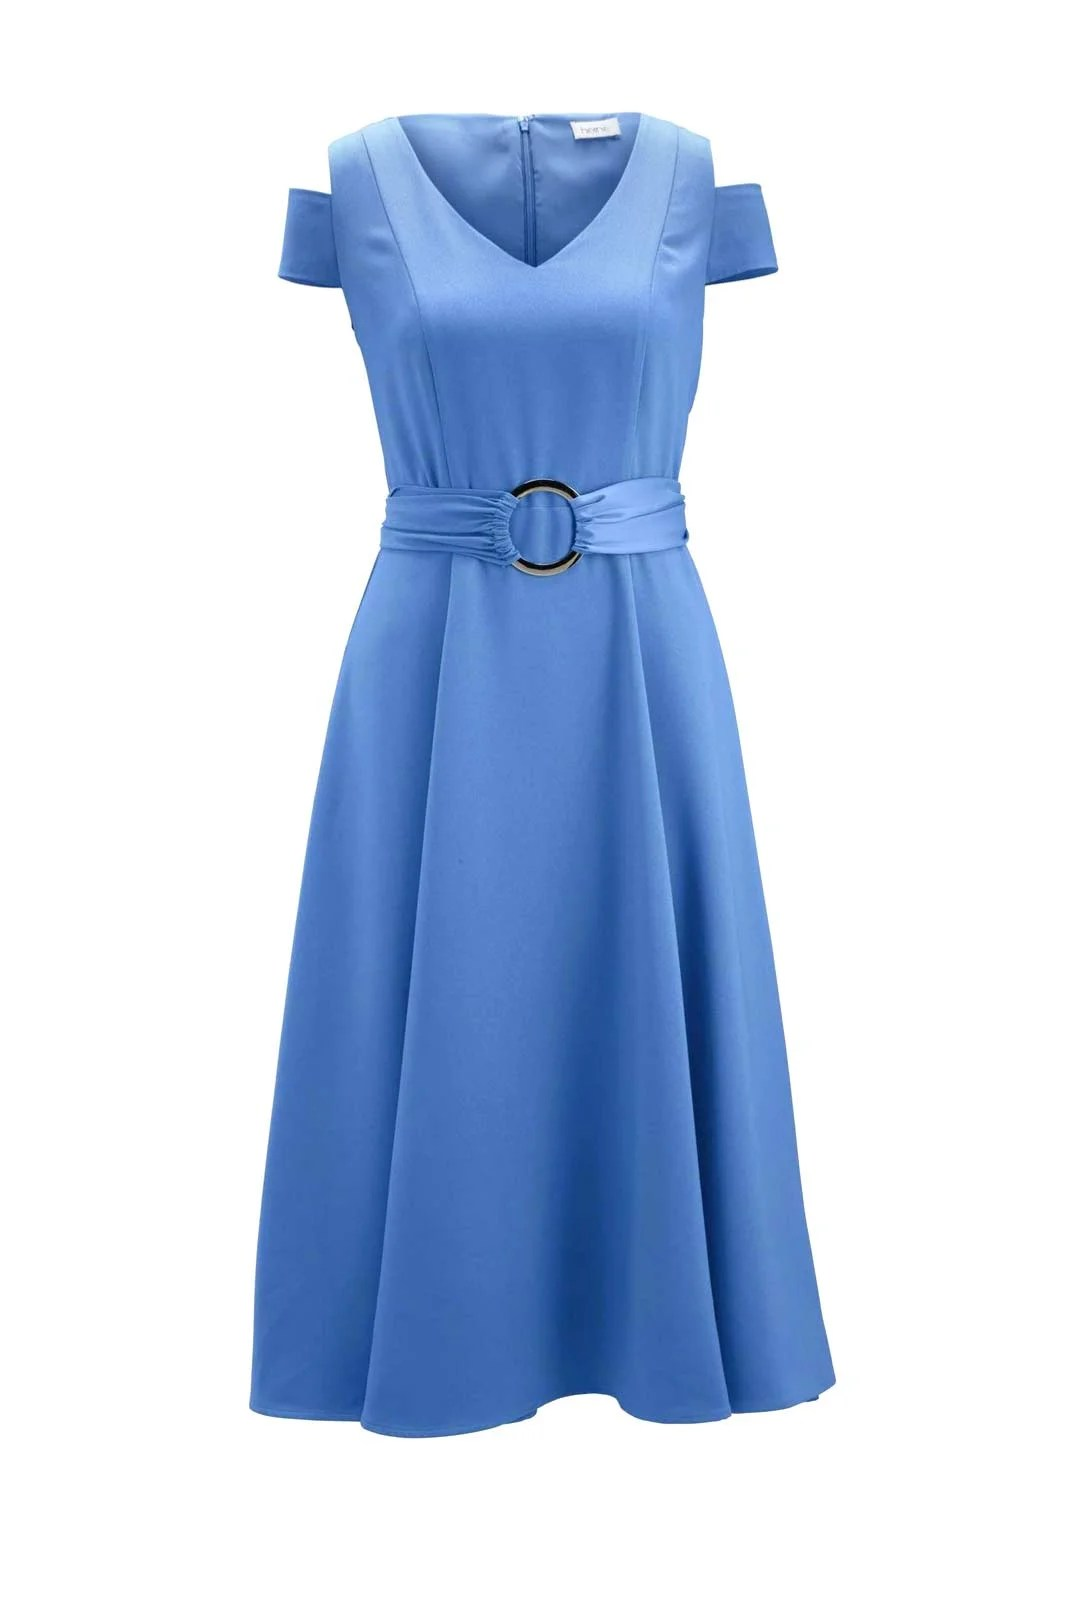 131.040 HEINE Damen Designer-Kleid m. Gürtel Aqua